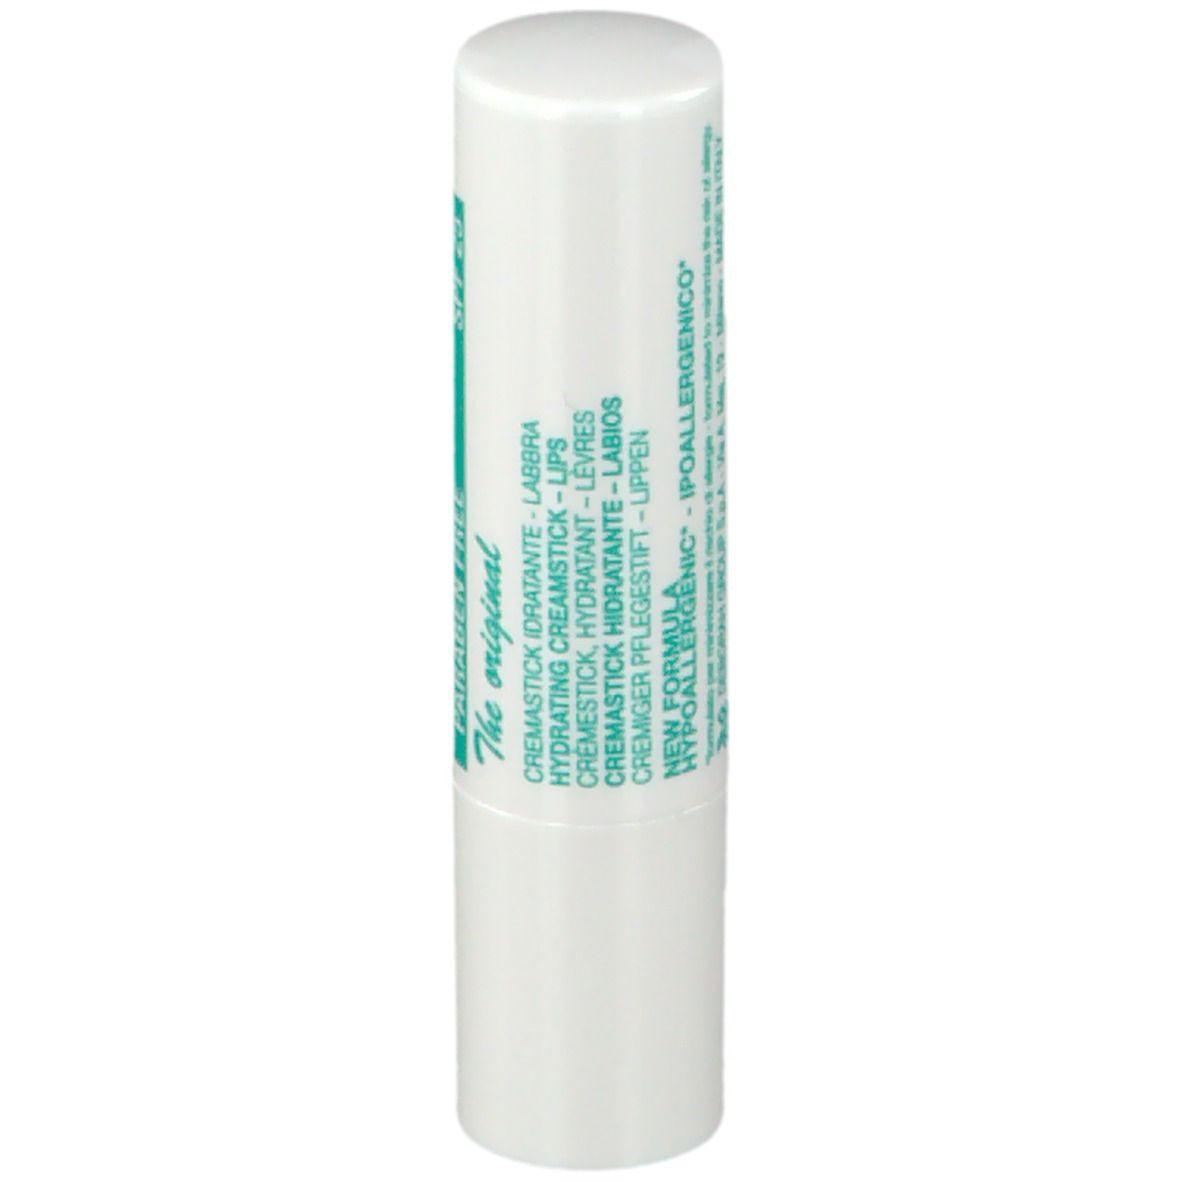 Hydracolor Lippenpflege 22 Beige Nude ab 3,78